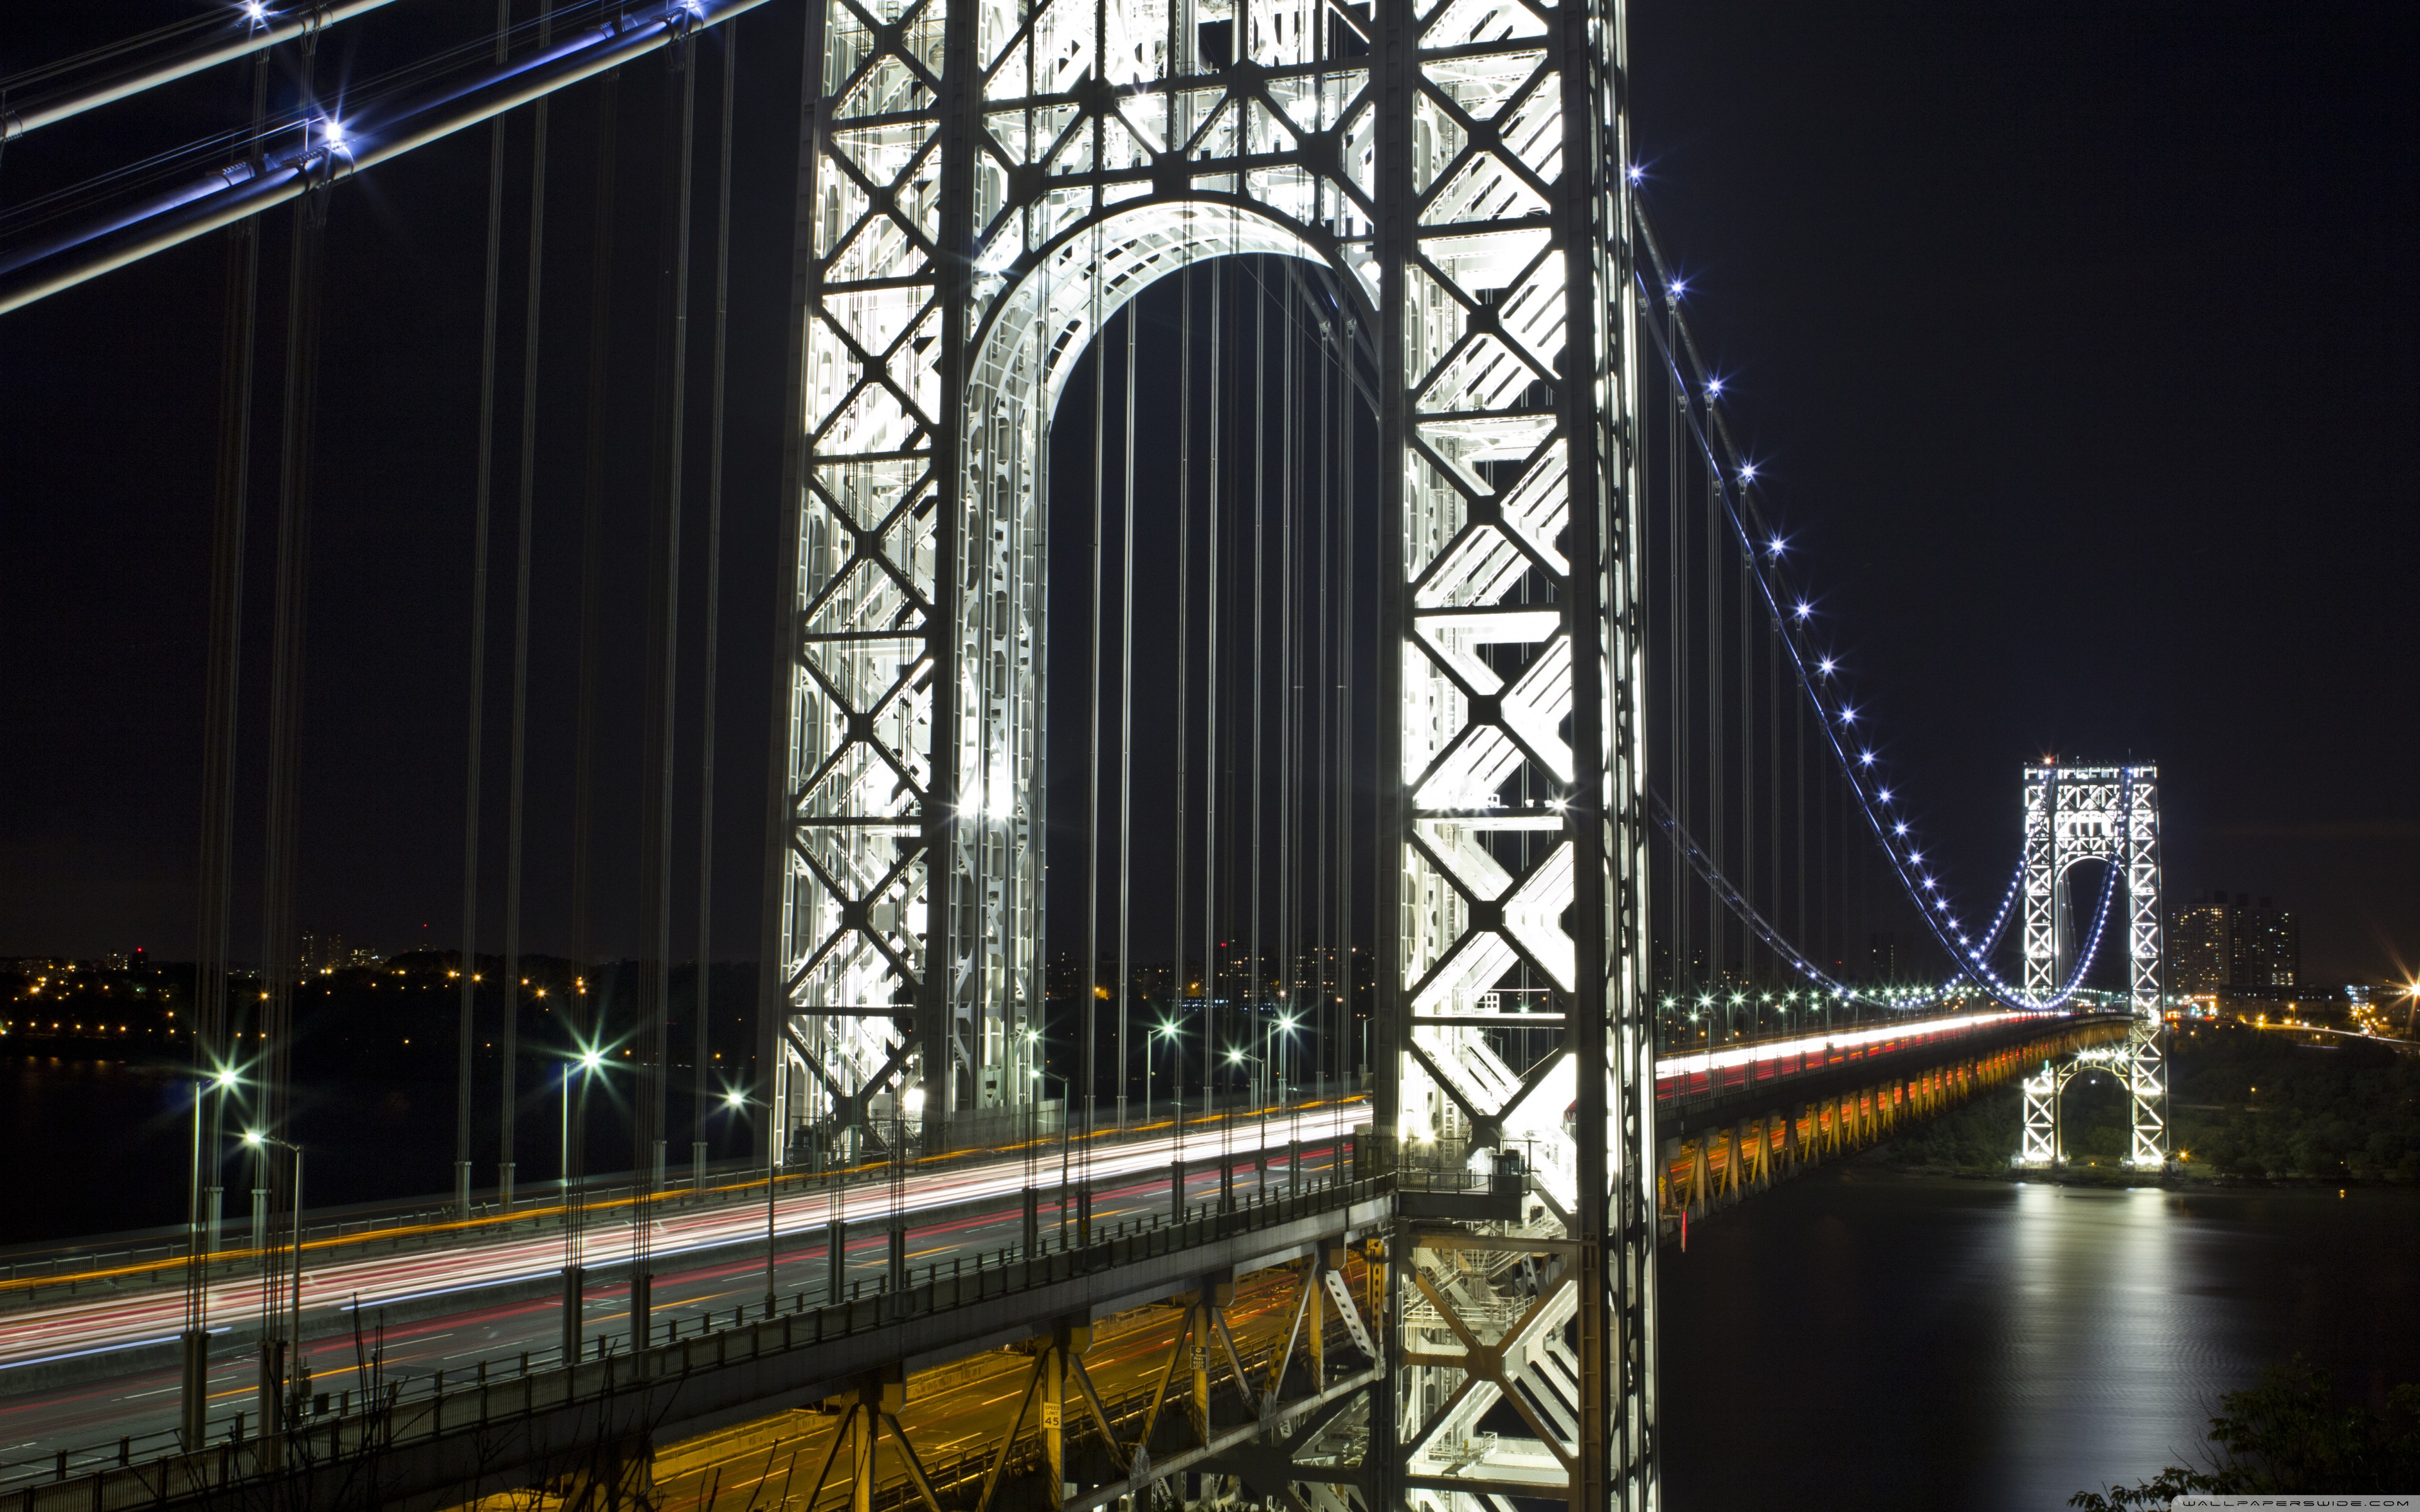 George Washington Bridge Wallpaper 12   3840 X 2400 stmednet 3840x2400